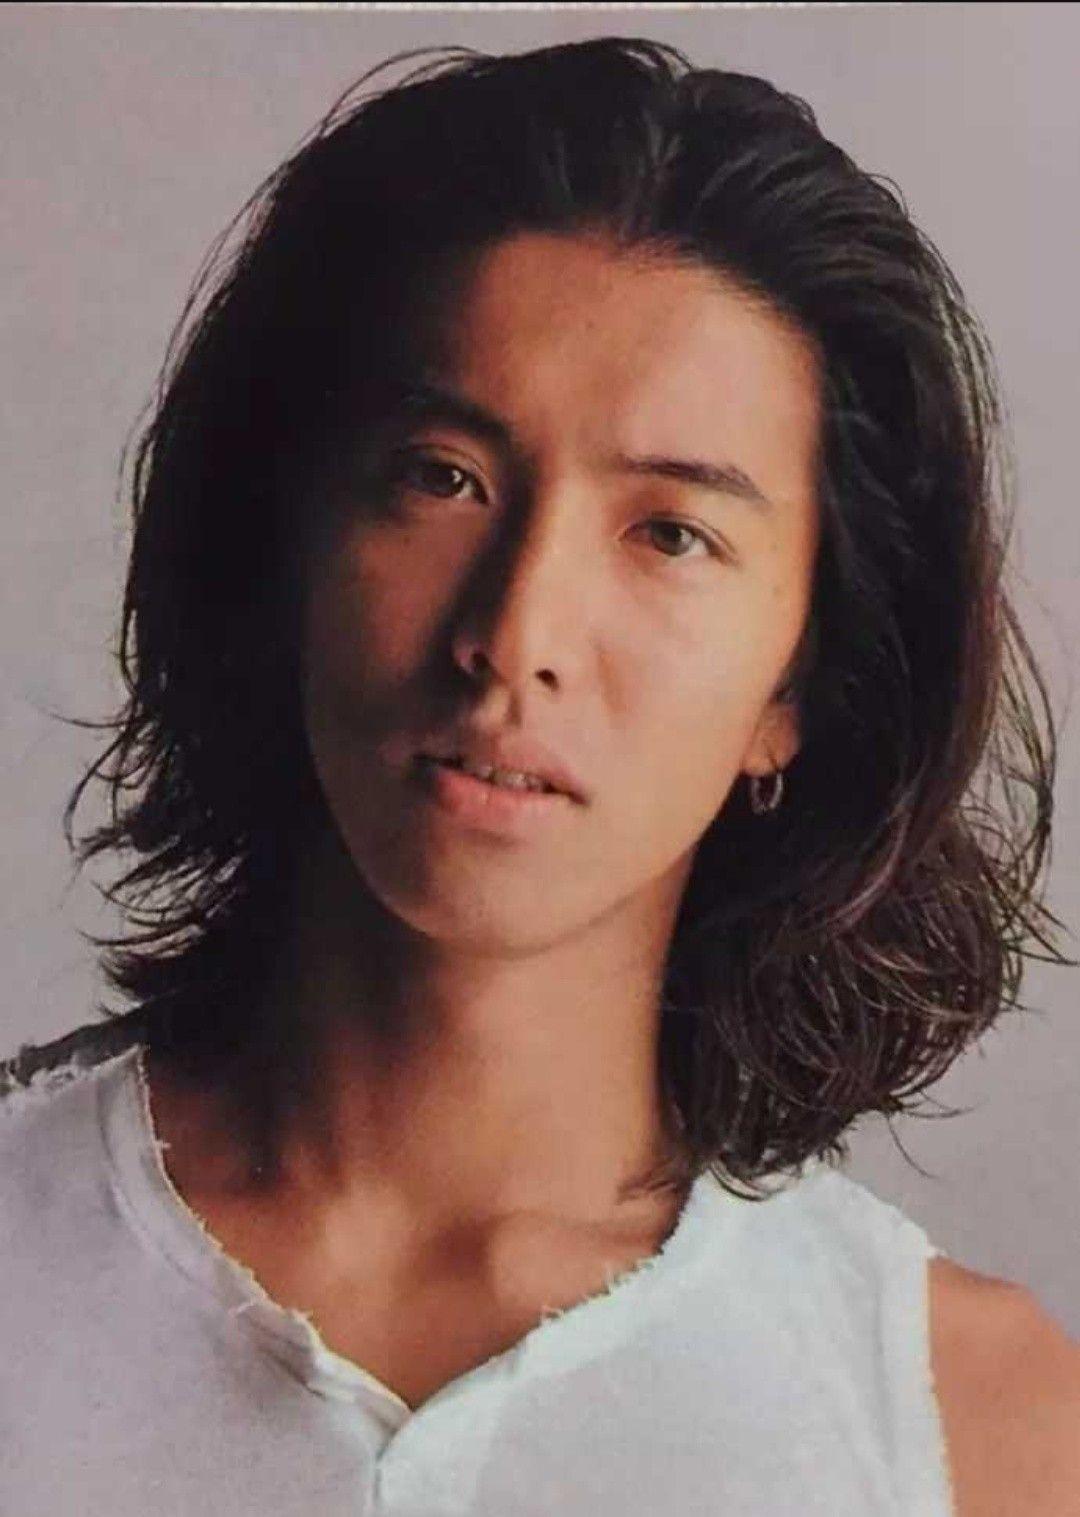 Takuya Kimura メンズヘアスタイル ロング メンズ 長髪 メンズ ヘアスタイル